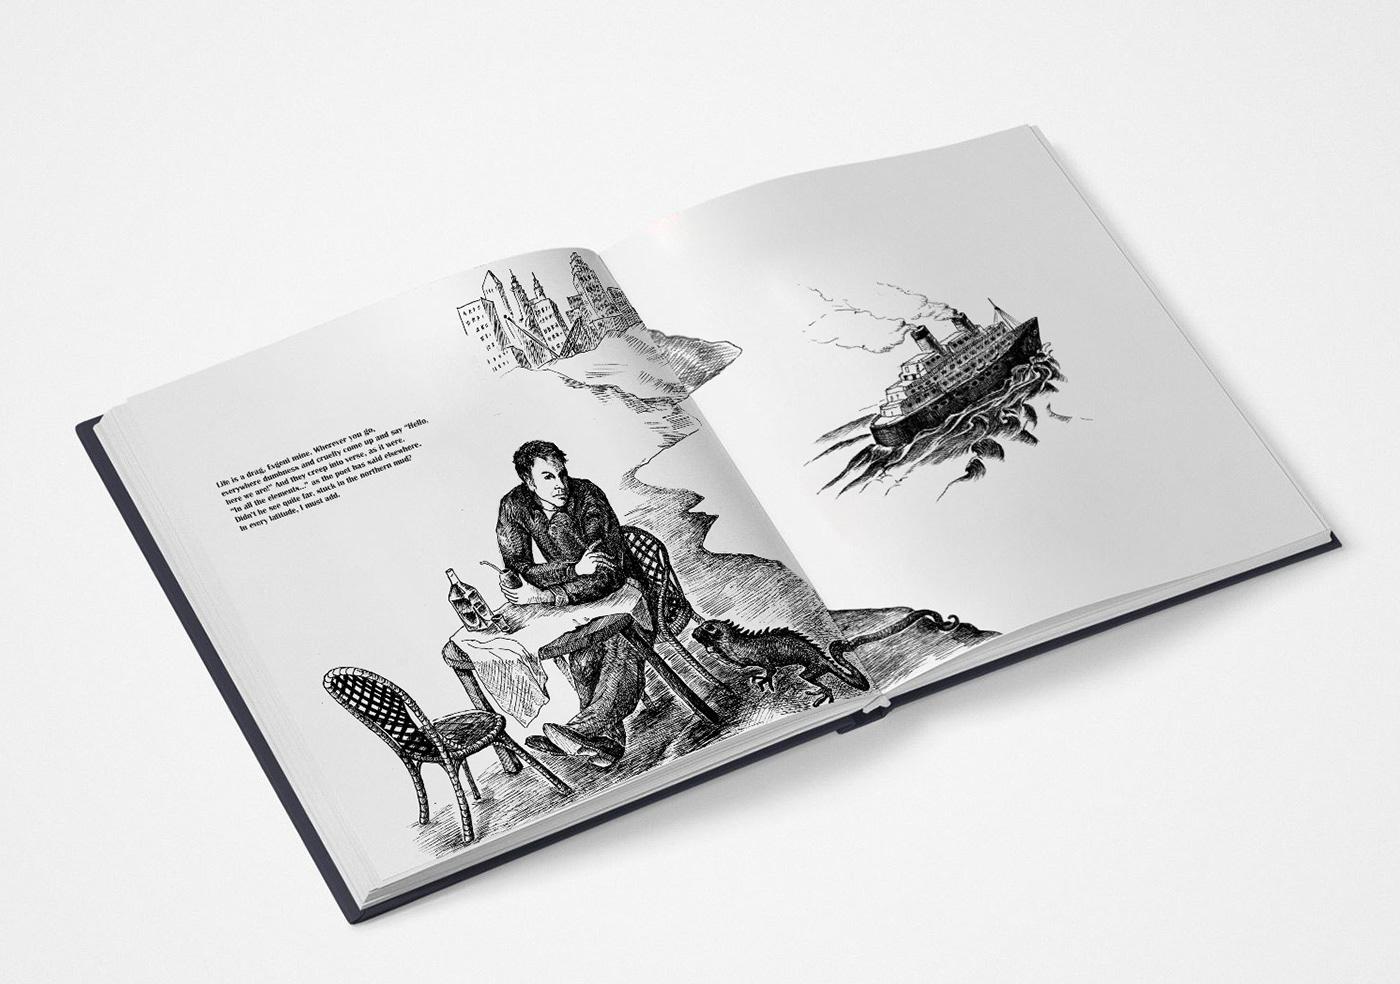 book design book illustration graphics Joseph Brodsky mexica black and white editorial design